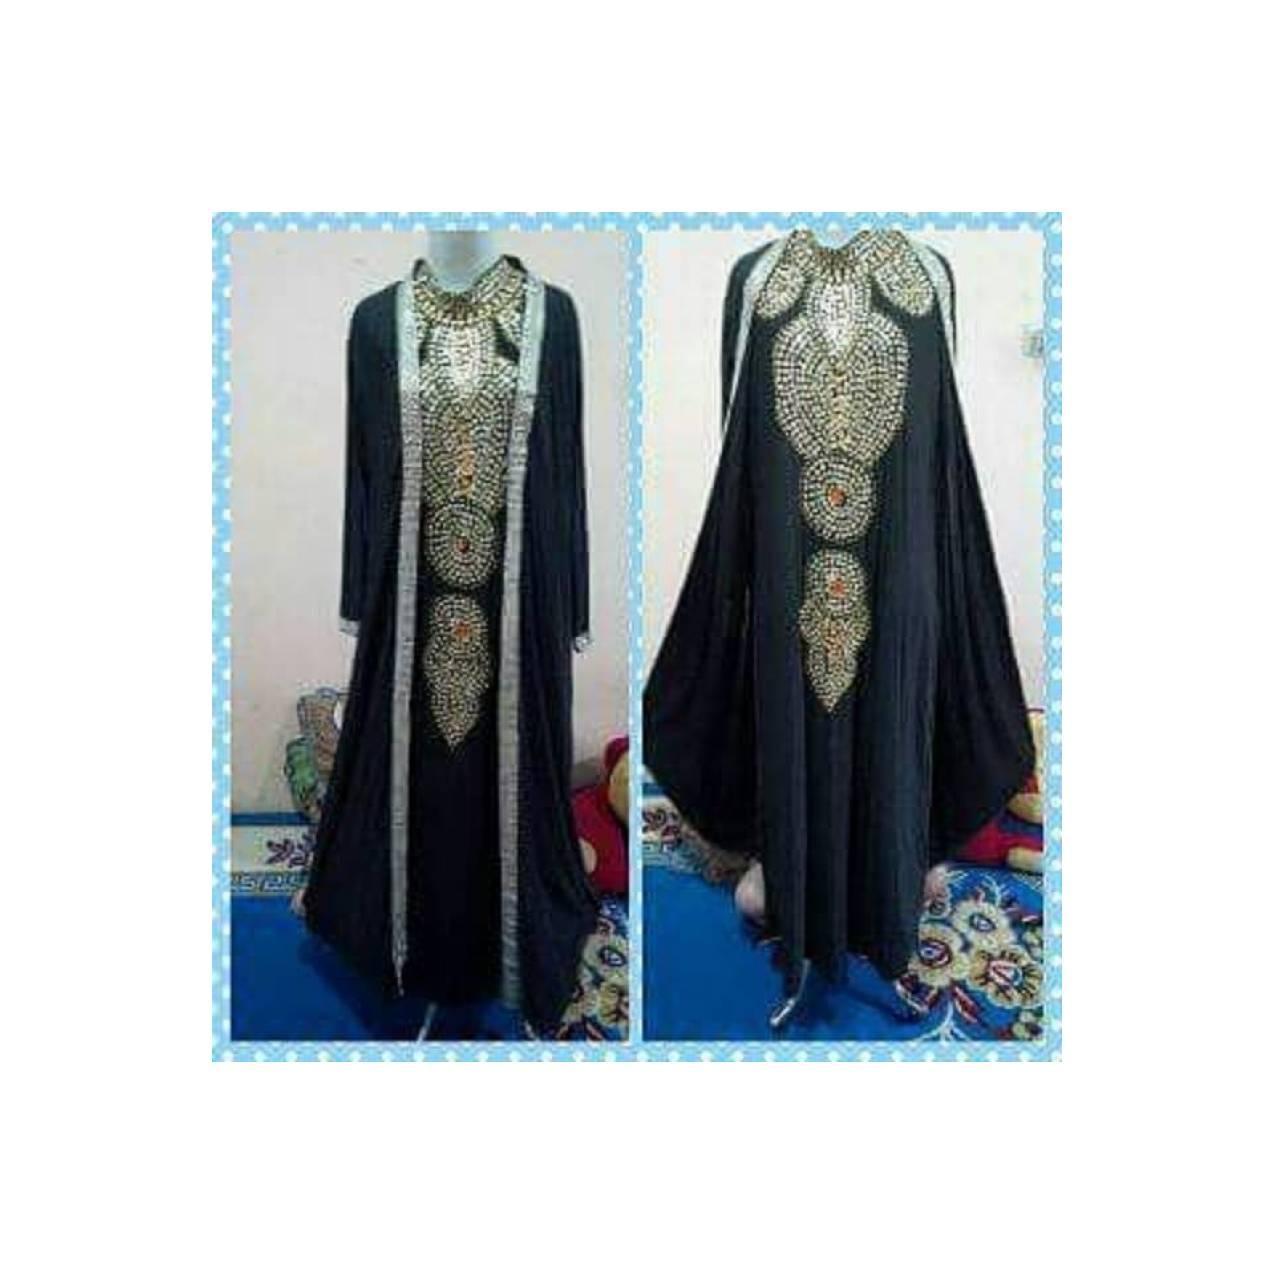 Kaftan Rompi Baju Pesta Dress Wanita Import Baju Muslim Warna Hitam